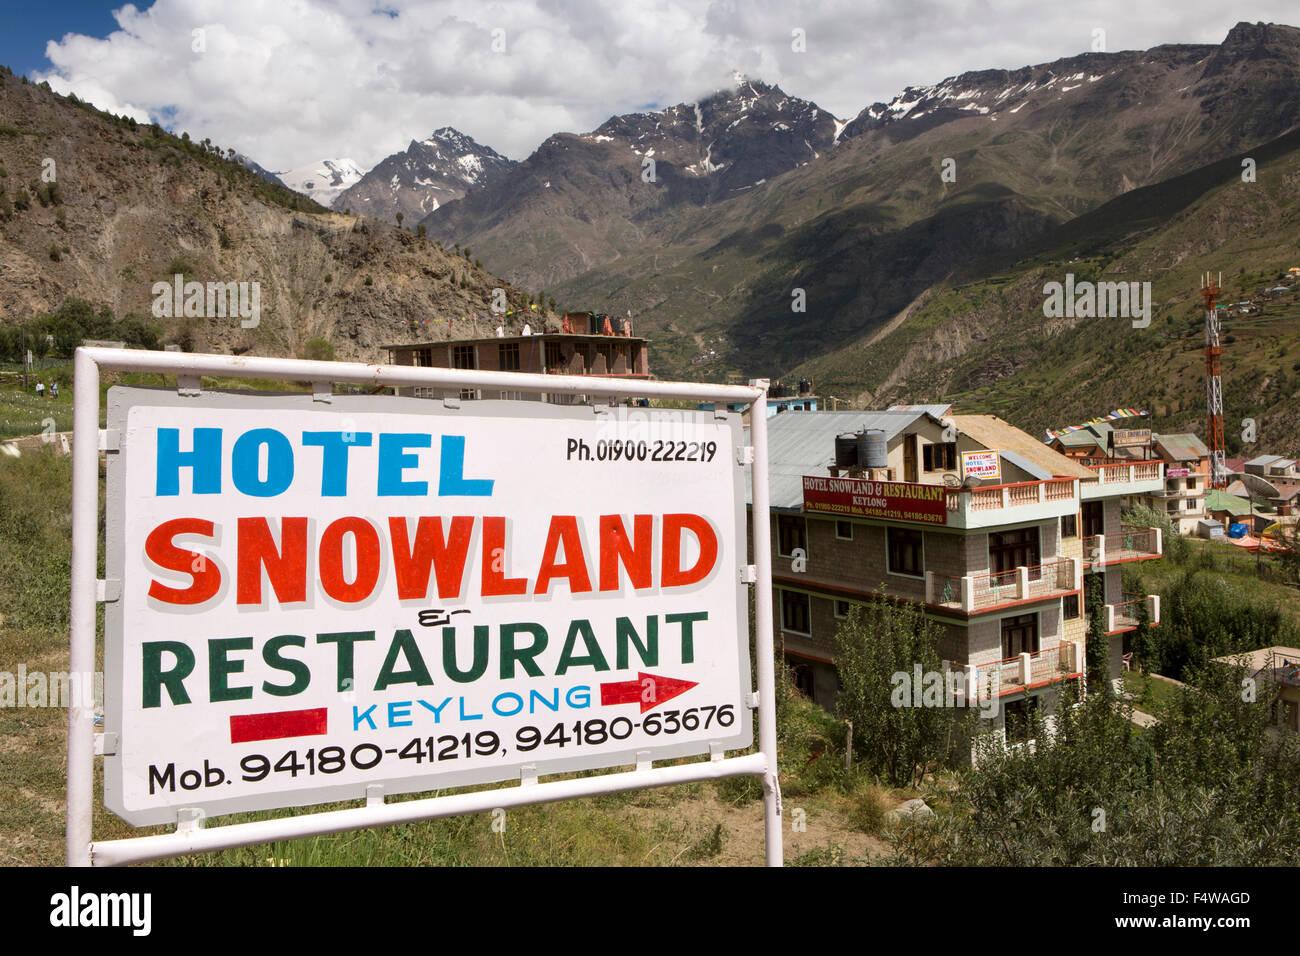 India, Himachal Pradesh, Lahaul and Spiti, Keylong, Hotel Snowland accommodation sign - Stock Image